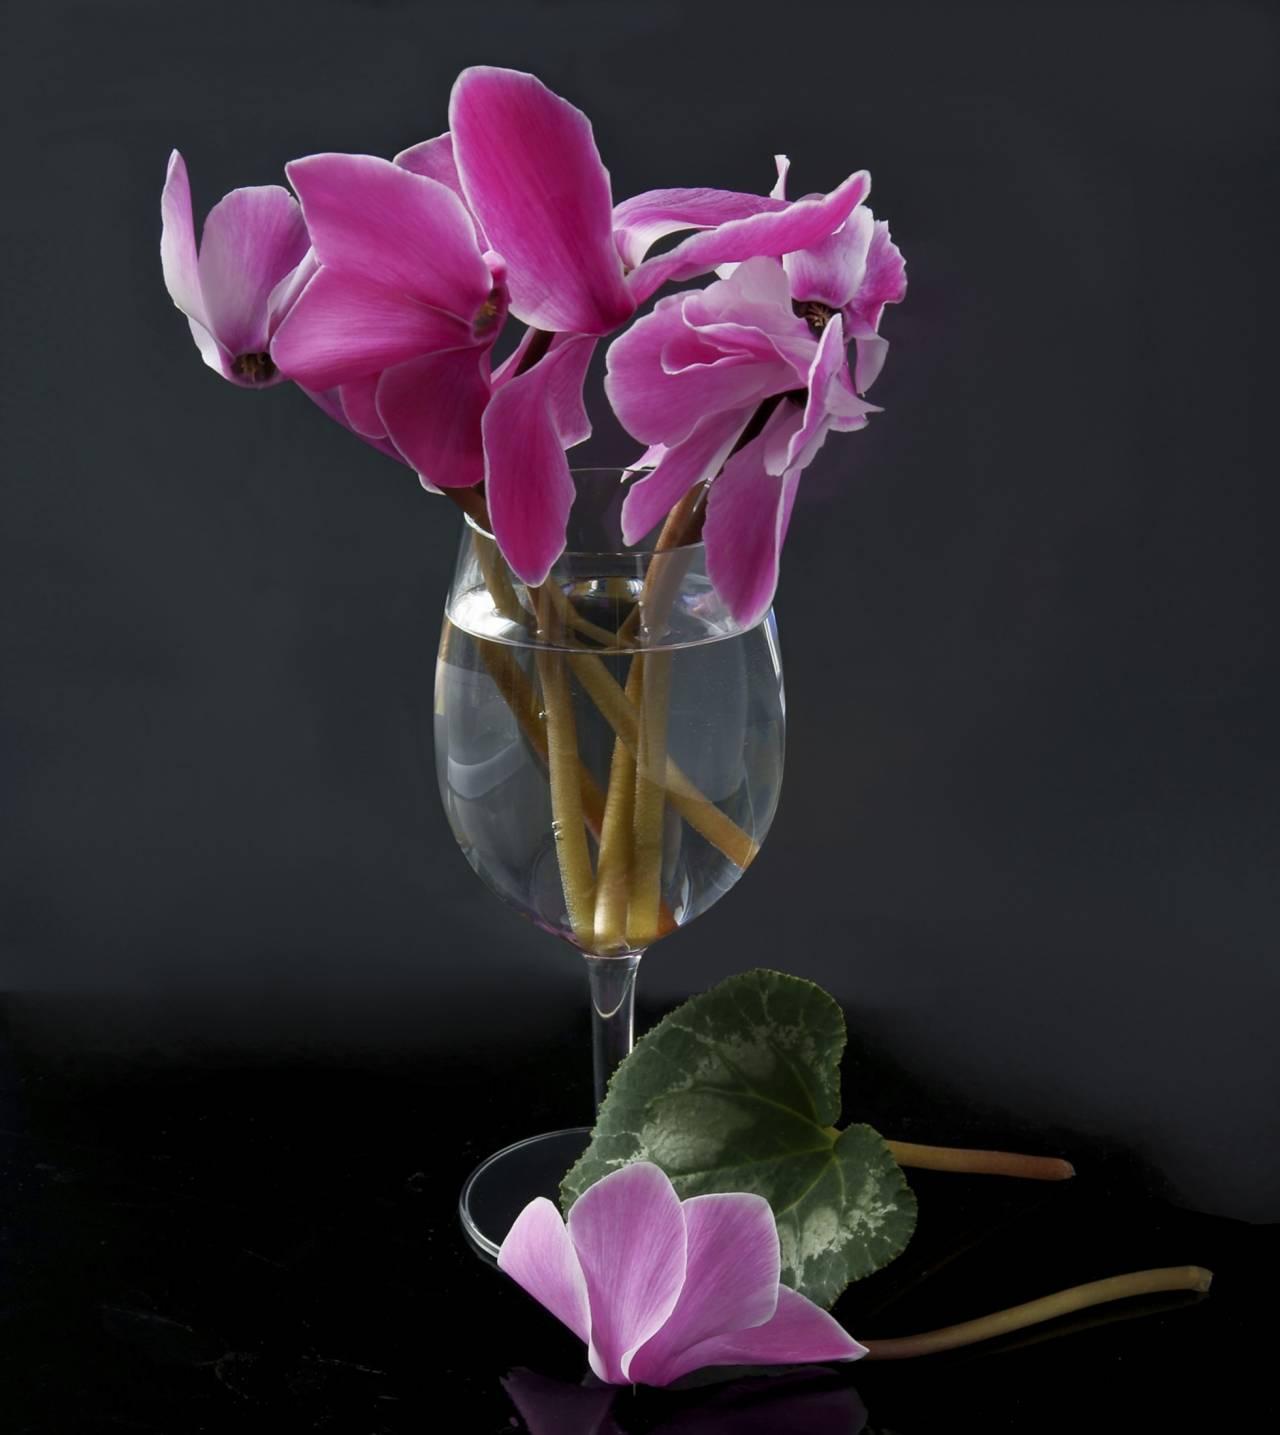 Cyklamen som snittblomma i litet glas